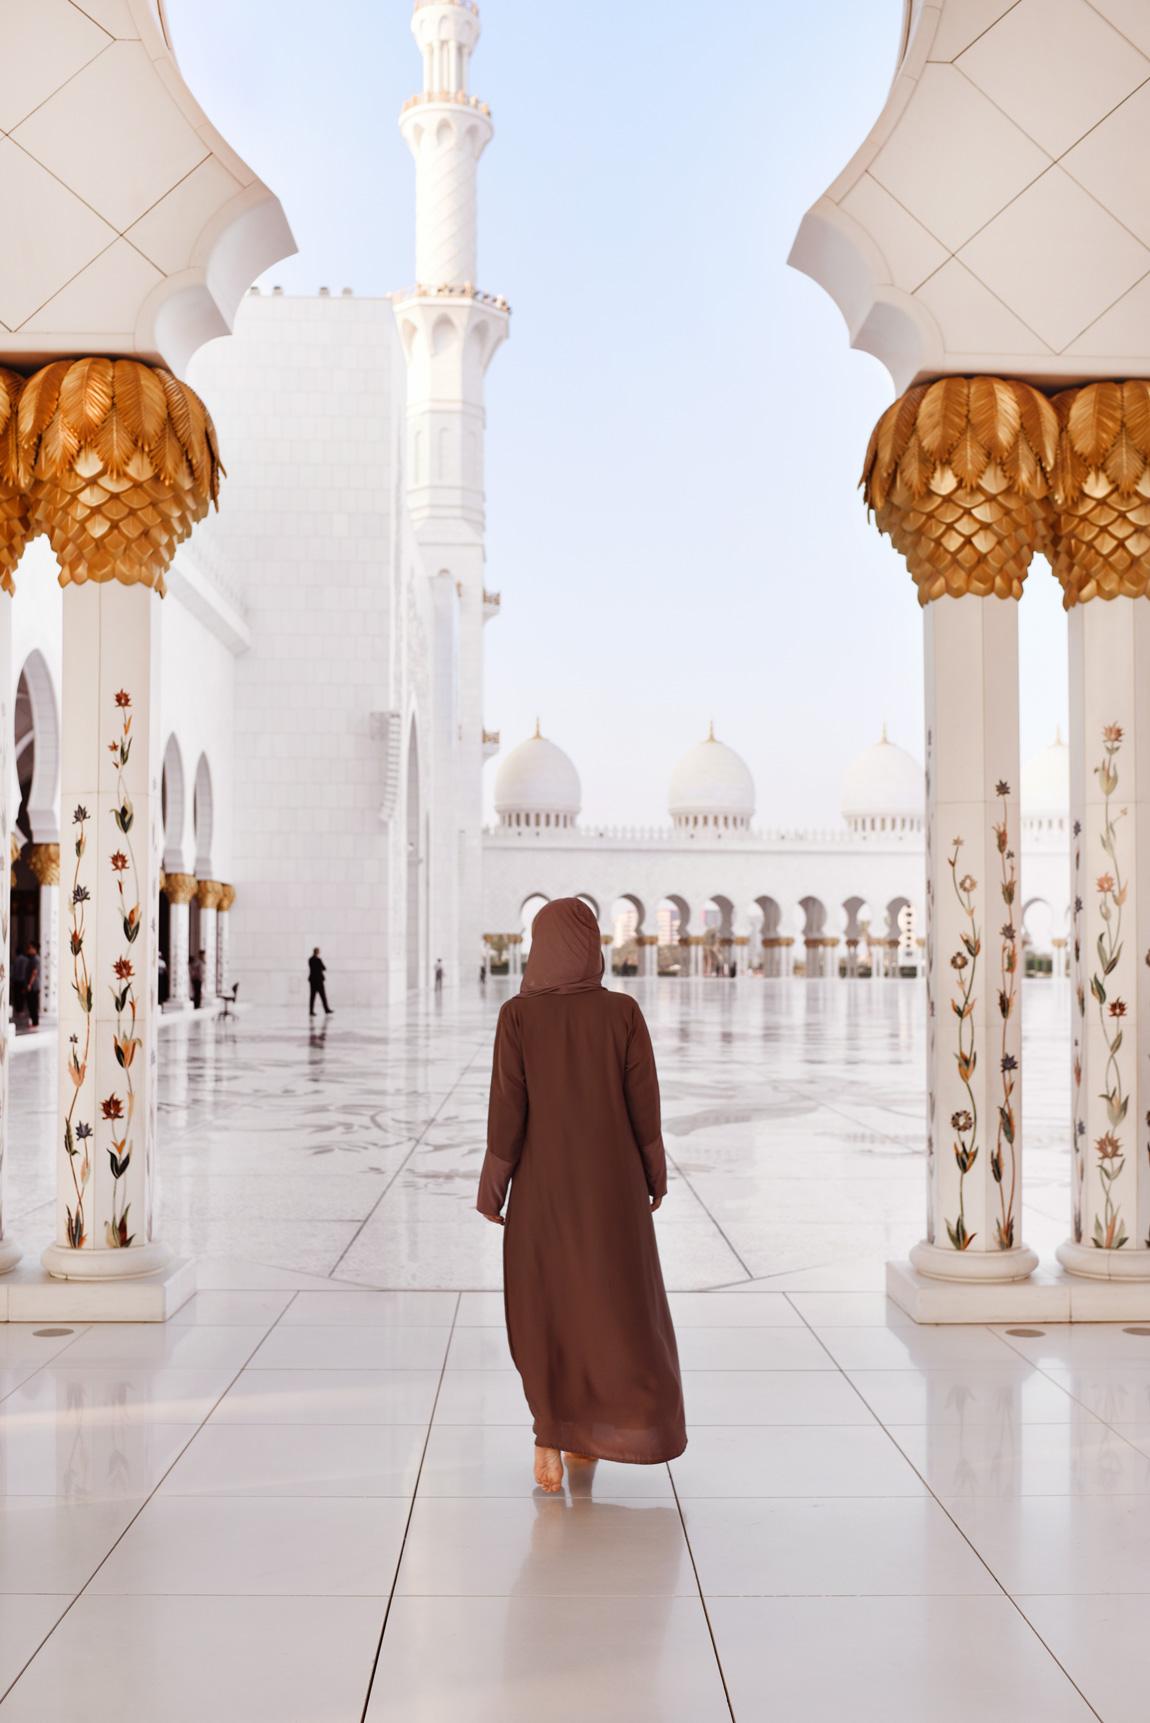 abu, dhabi, emirate, vae, reise, urlaub, travel, blogger, blog, münchen, abaya, moschee, kultur